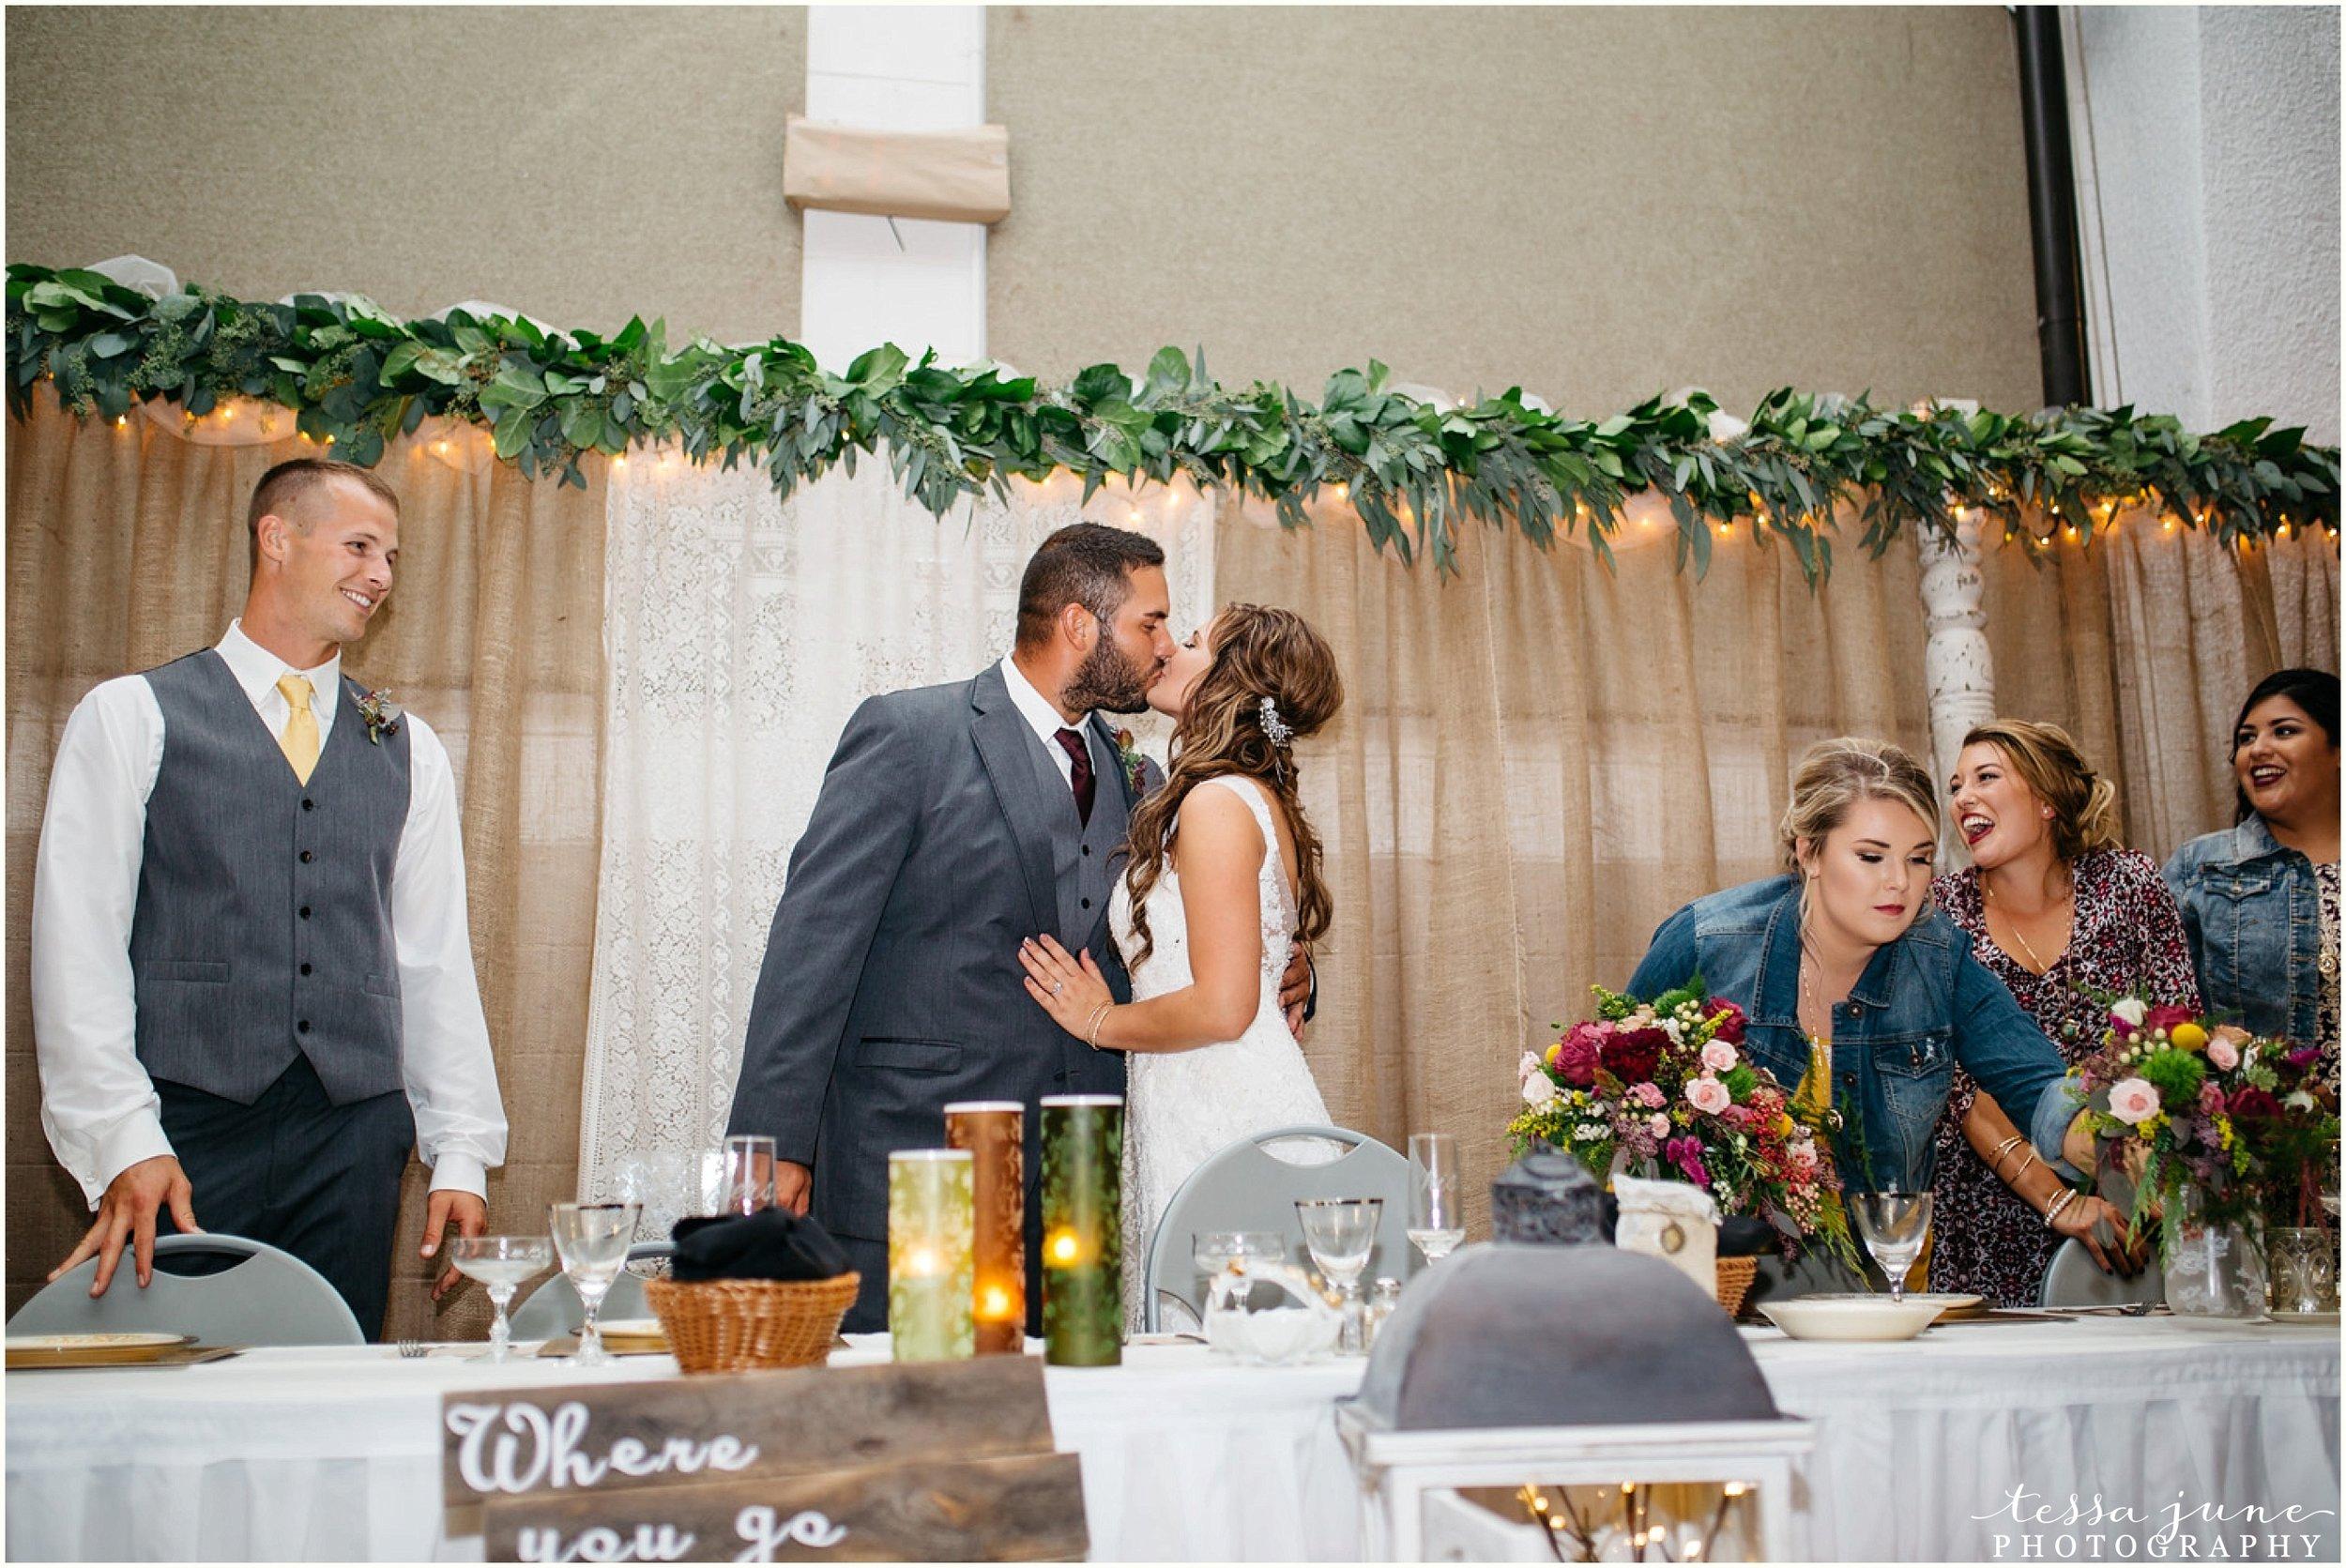 bohemian-minnesota-wedding-mismatched-bridesmaid-dresses-waterfall-st-cloud-tessa-june-photography-157.jpg